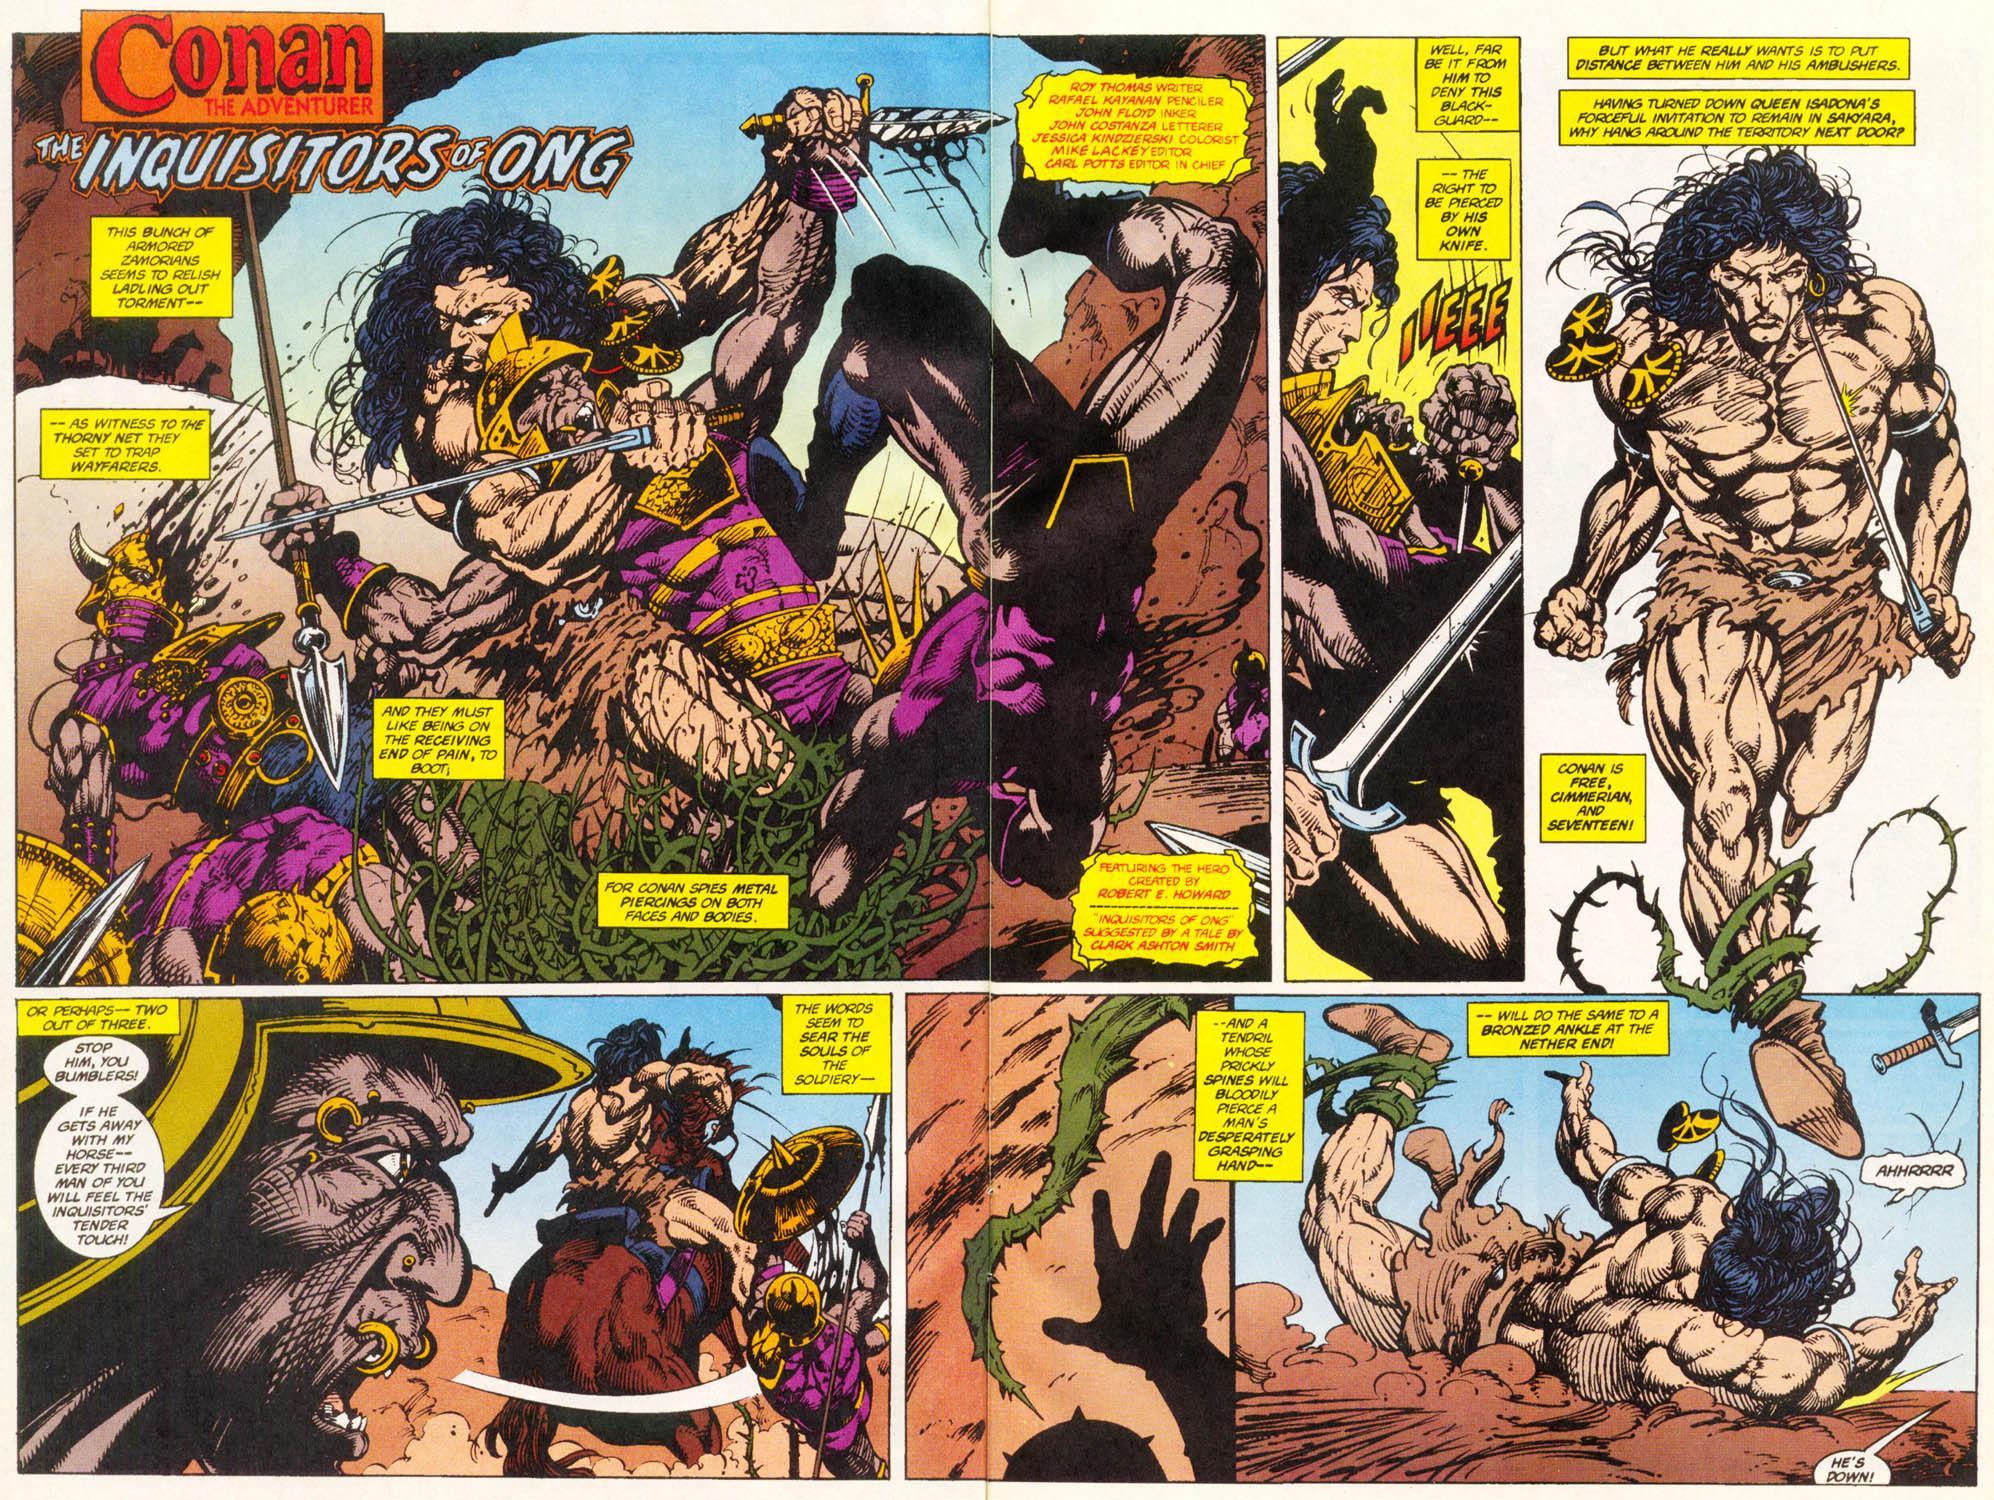 Read online Conan the Adventurer comic -  Issue #11 - 3